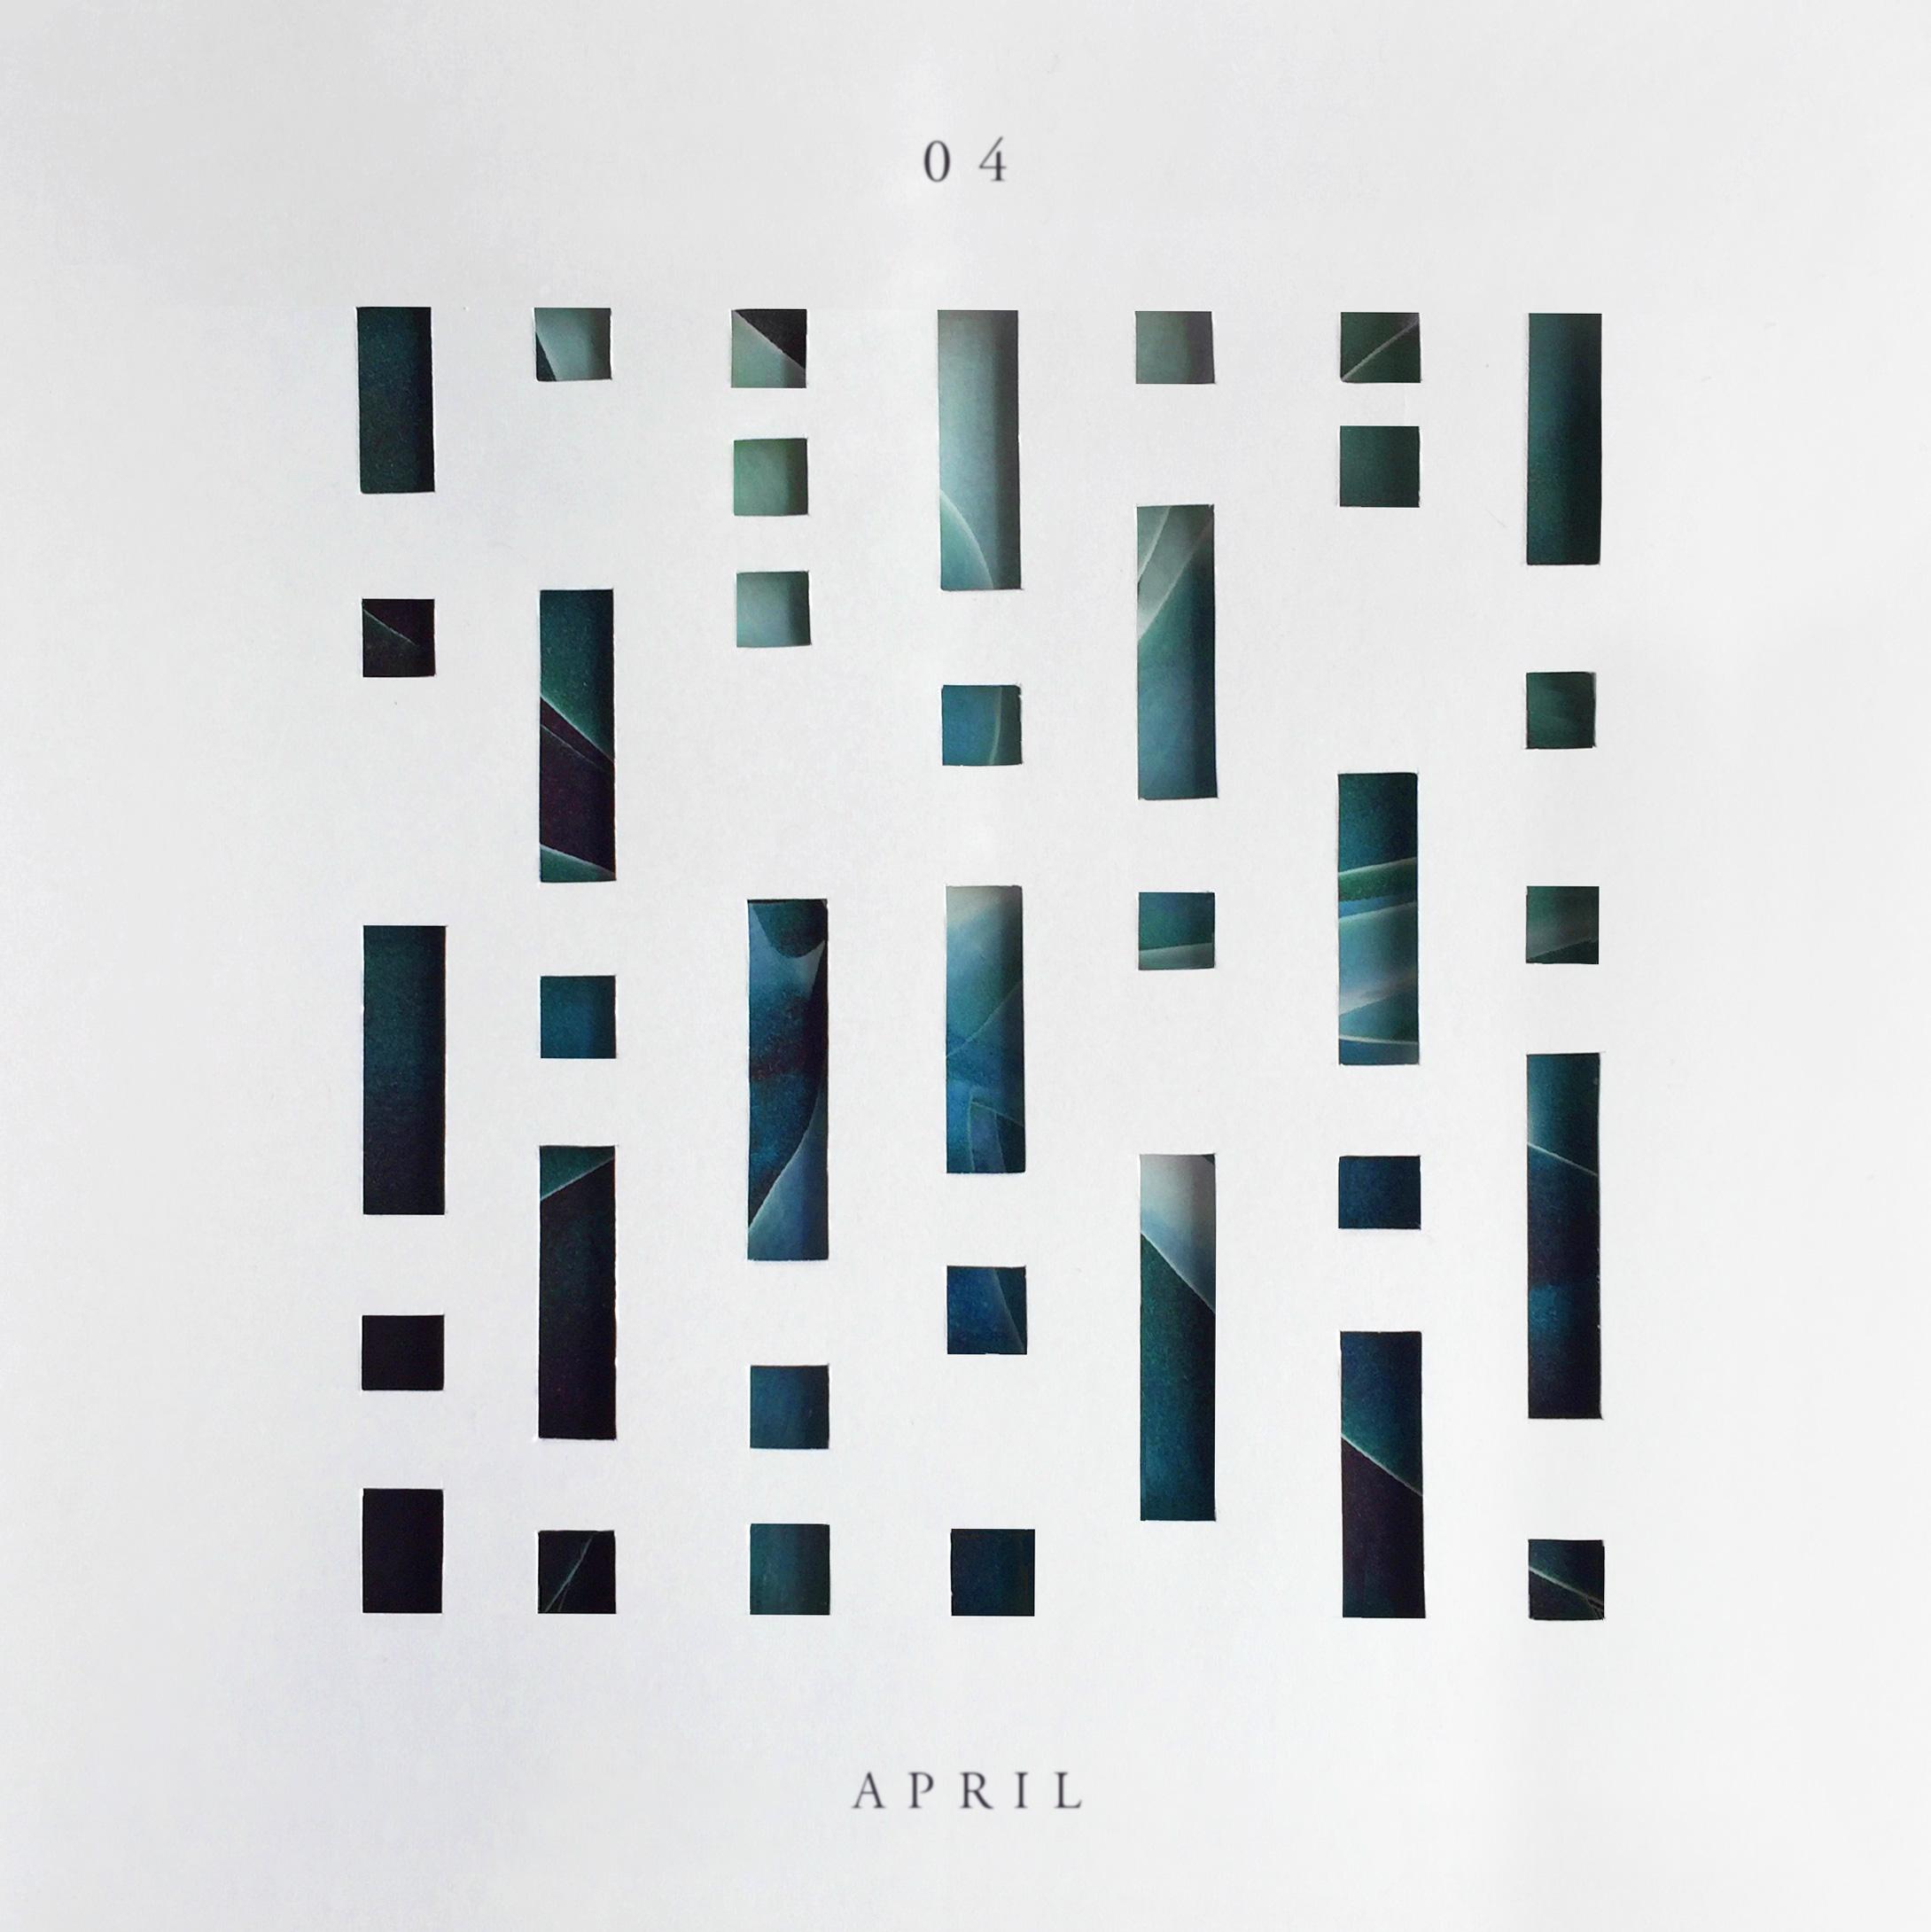 pennyweight-mixtape-04-april-cover-by-julia-kostreva.jpg